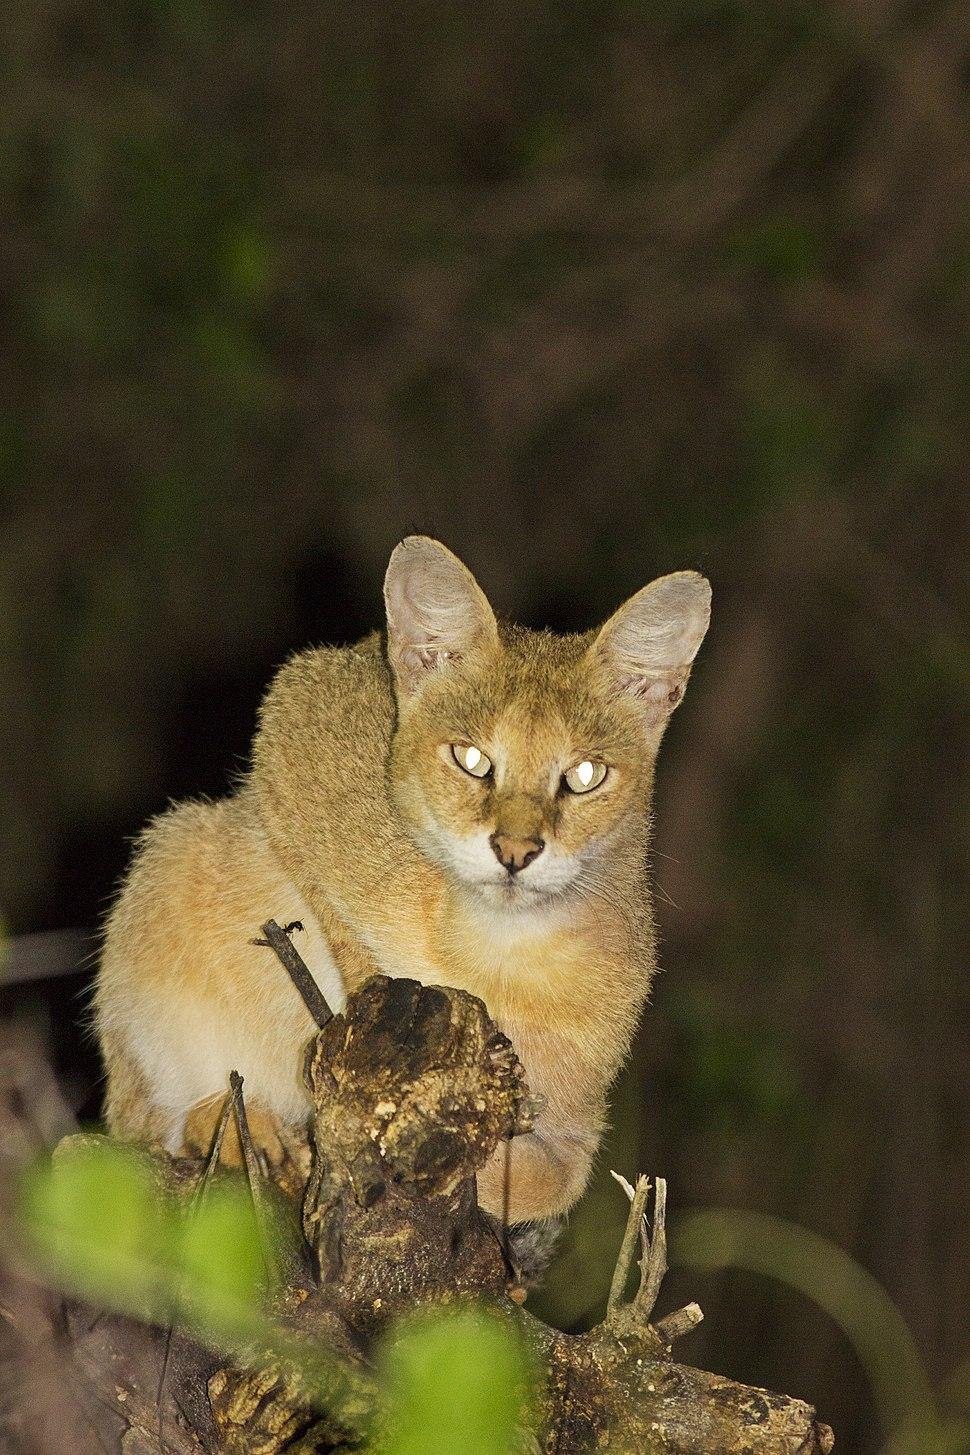 Jungle Cat near Thol Bird Sanctuary, Mehsana, Gujarat India